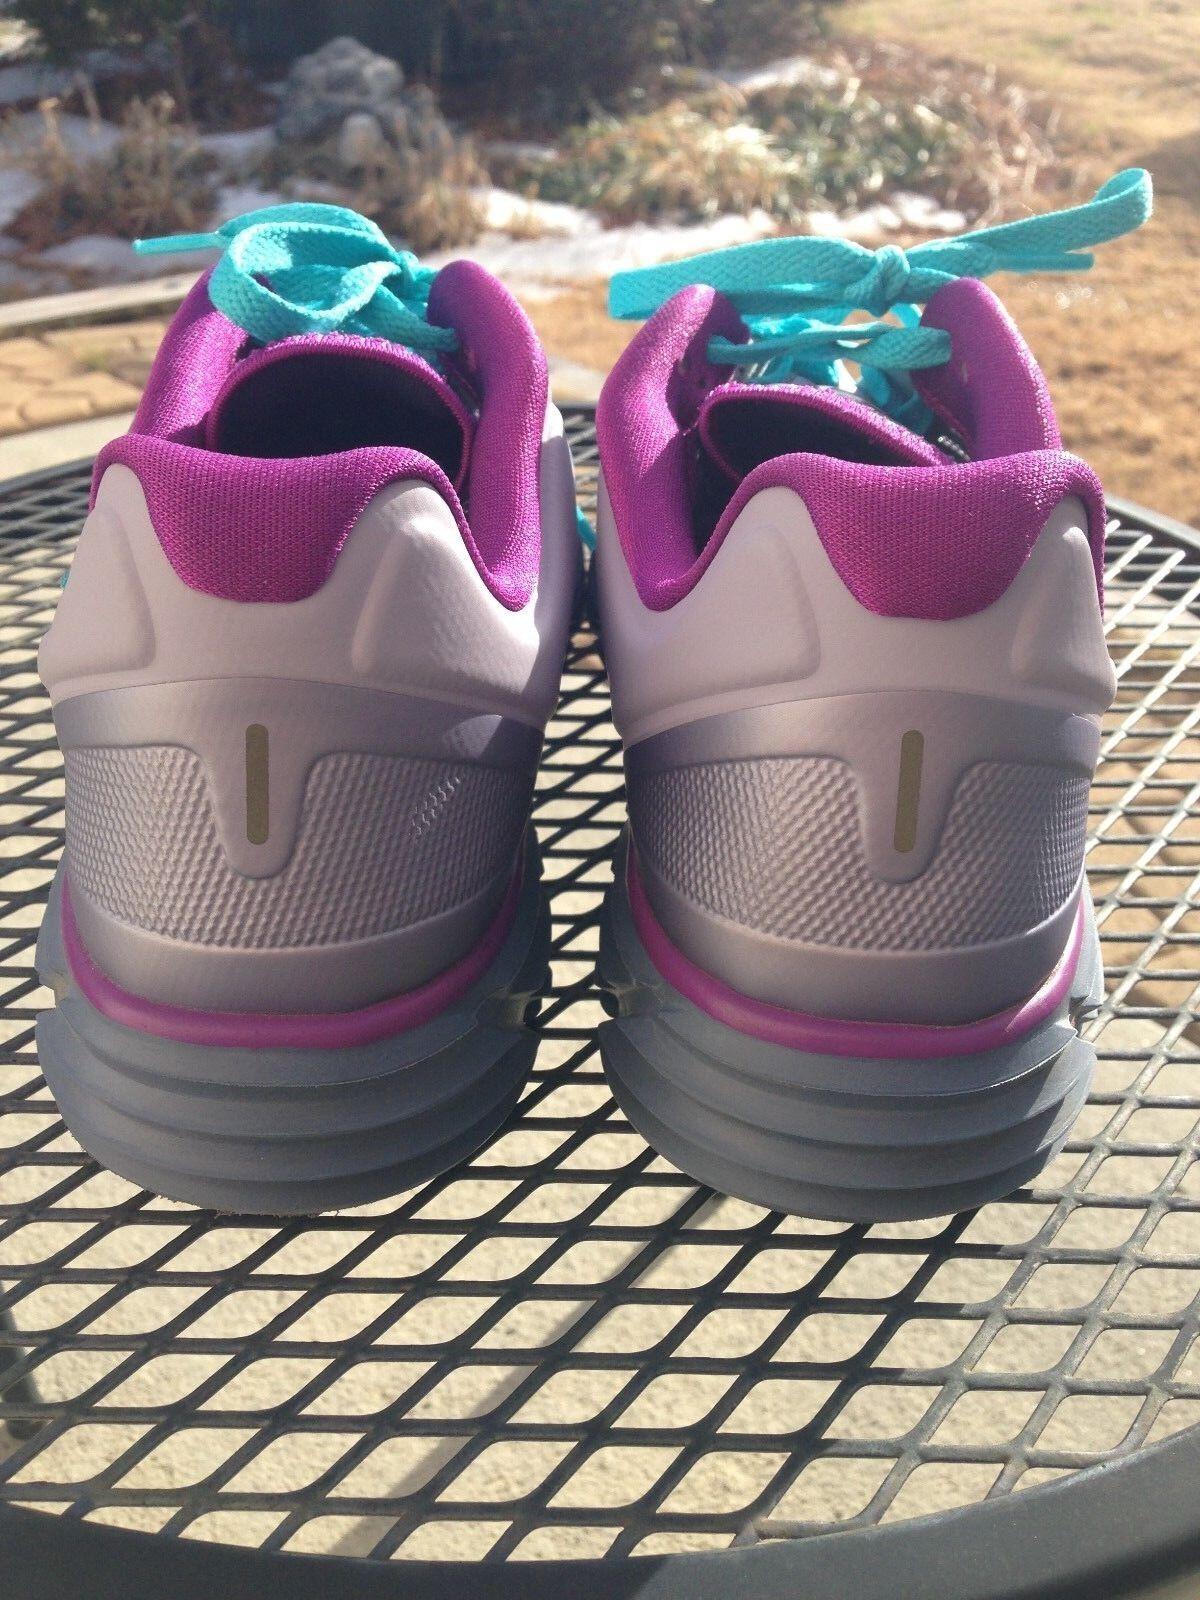 40f9ba265173 ... Mens Gray Nike Shoes Fitsole 2 Size 12 Lunar Lunar Lunar Victory eab64c